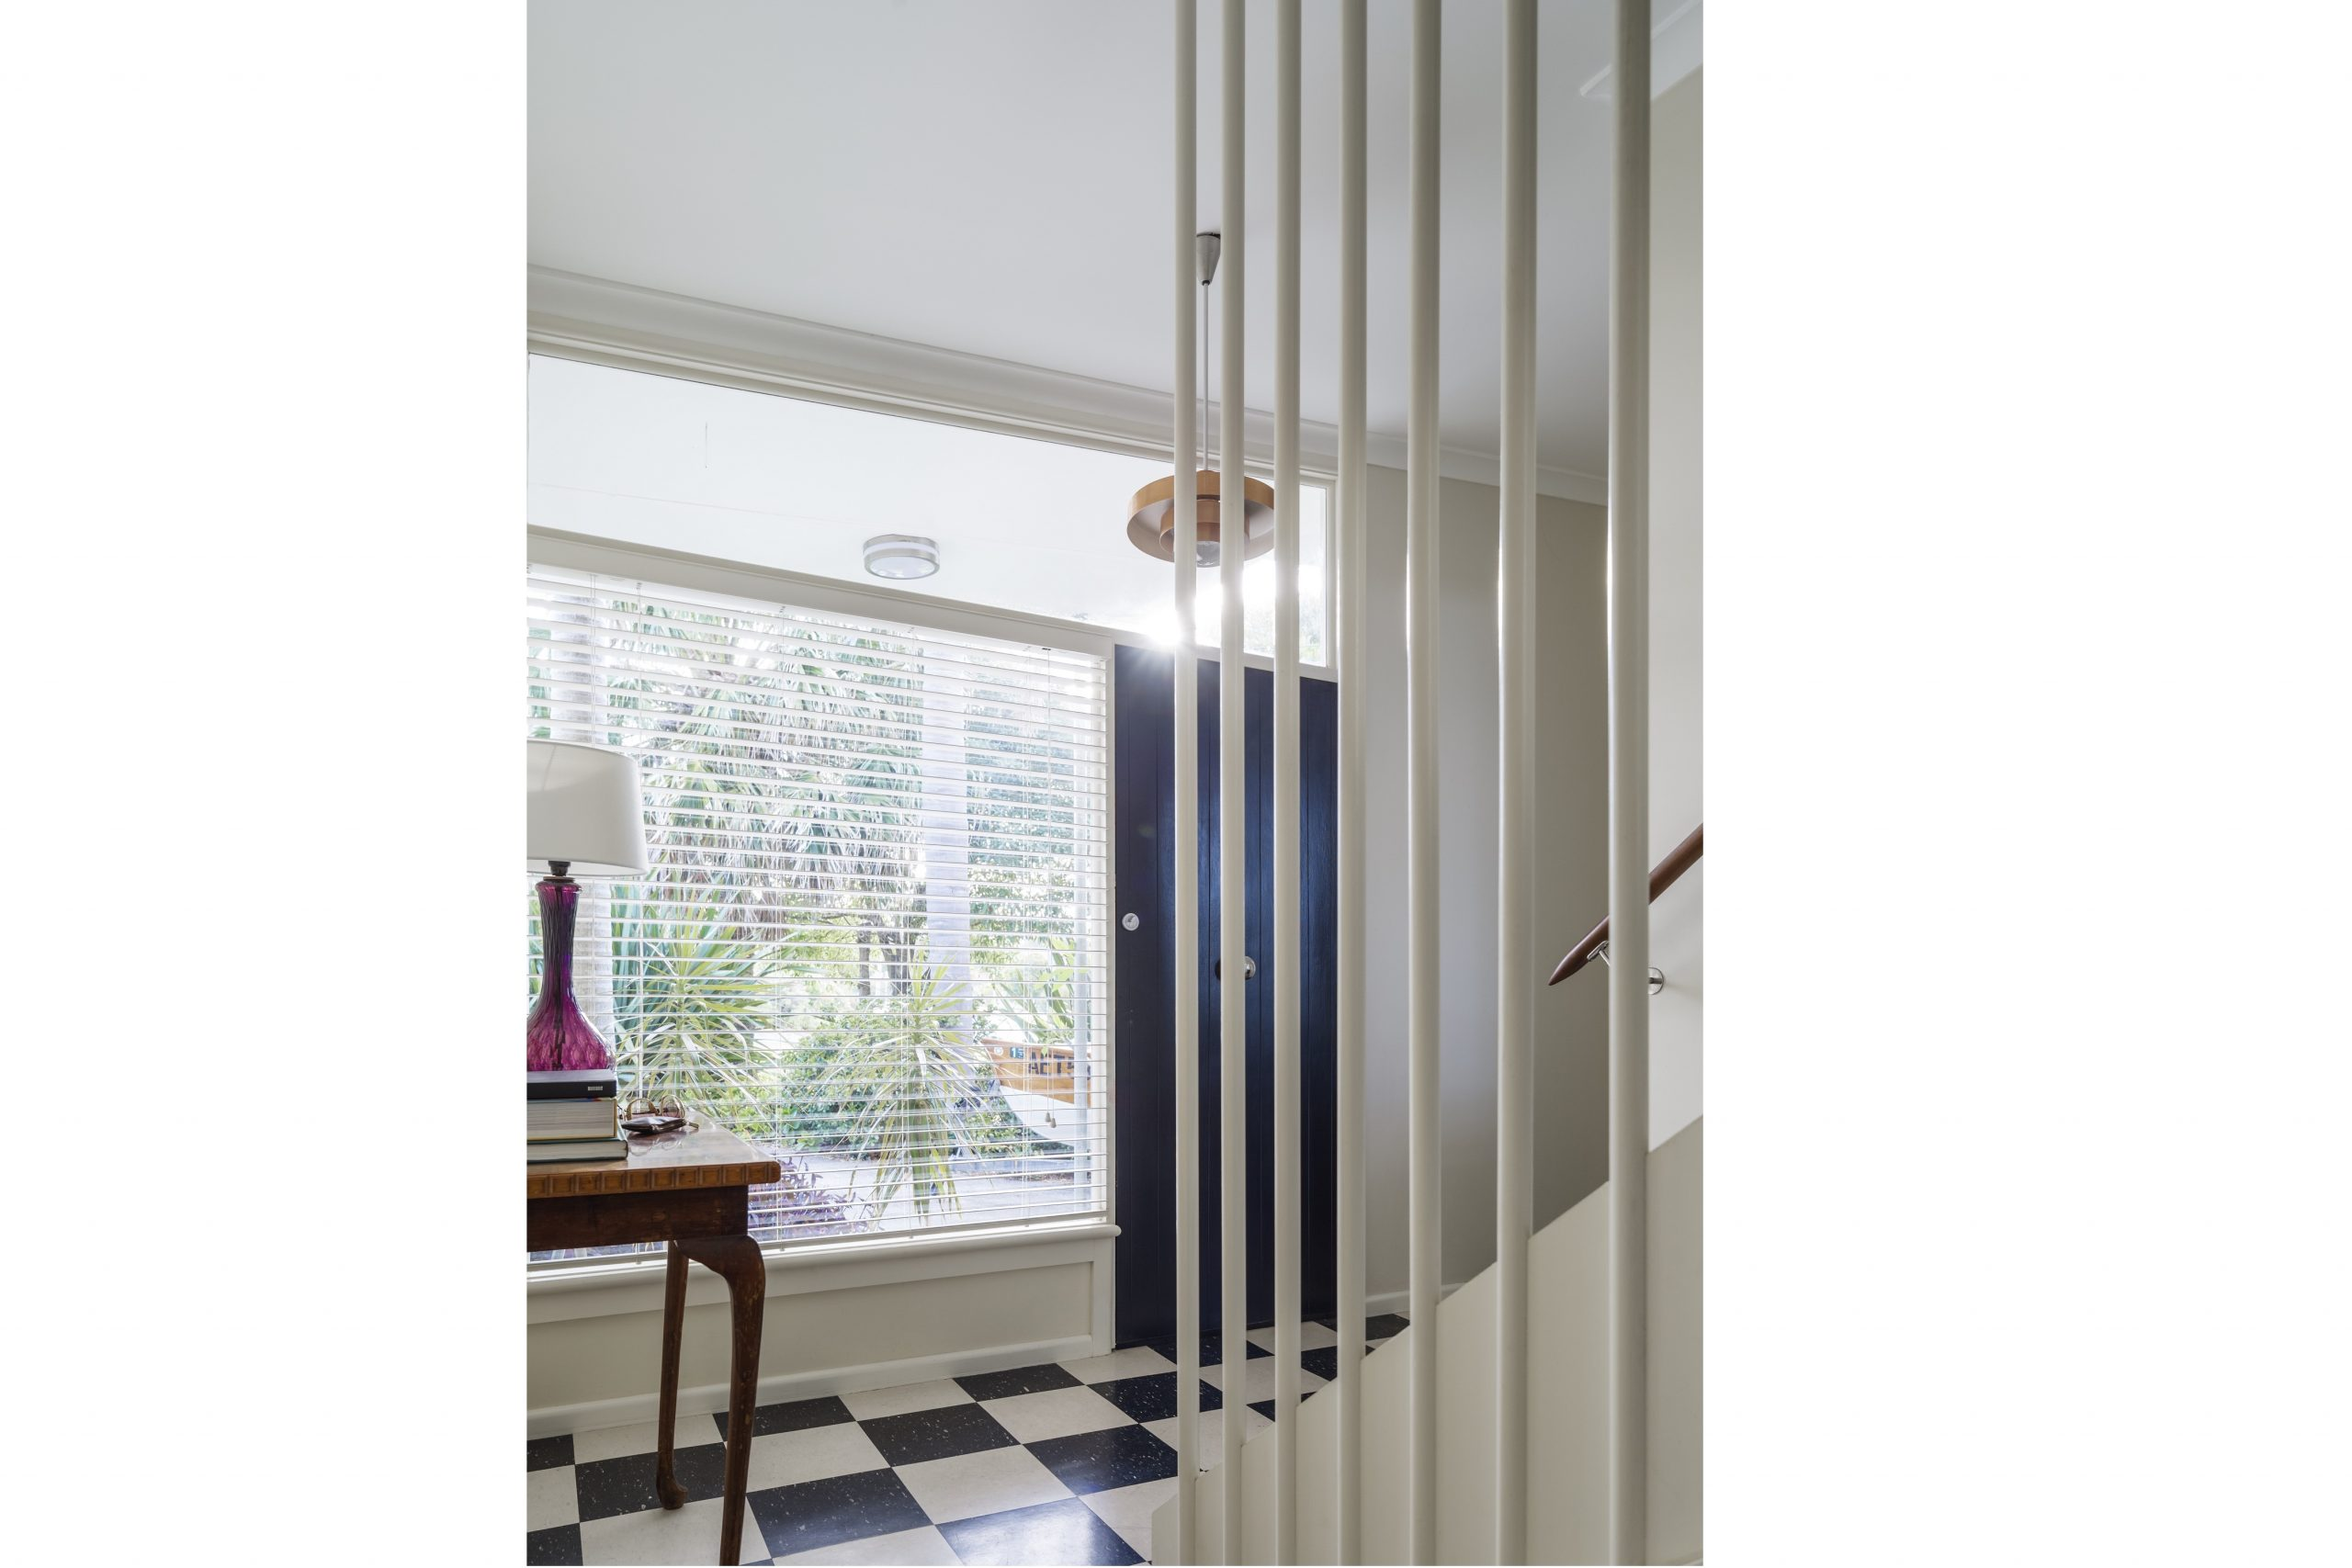 1970s-Checkerboard-Tiles-Entry-Interior-Decoration-Kiama-Michael-Bell-Architects-Sydney-2